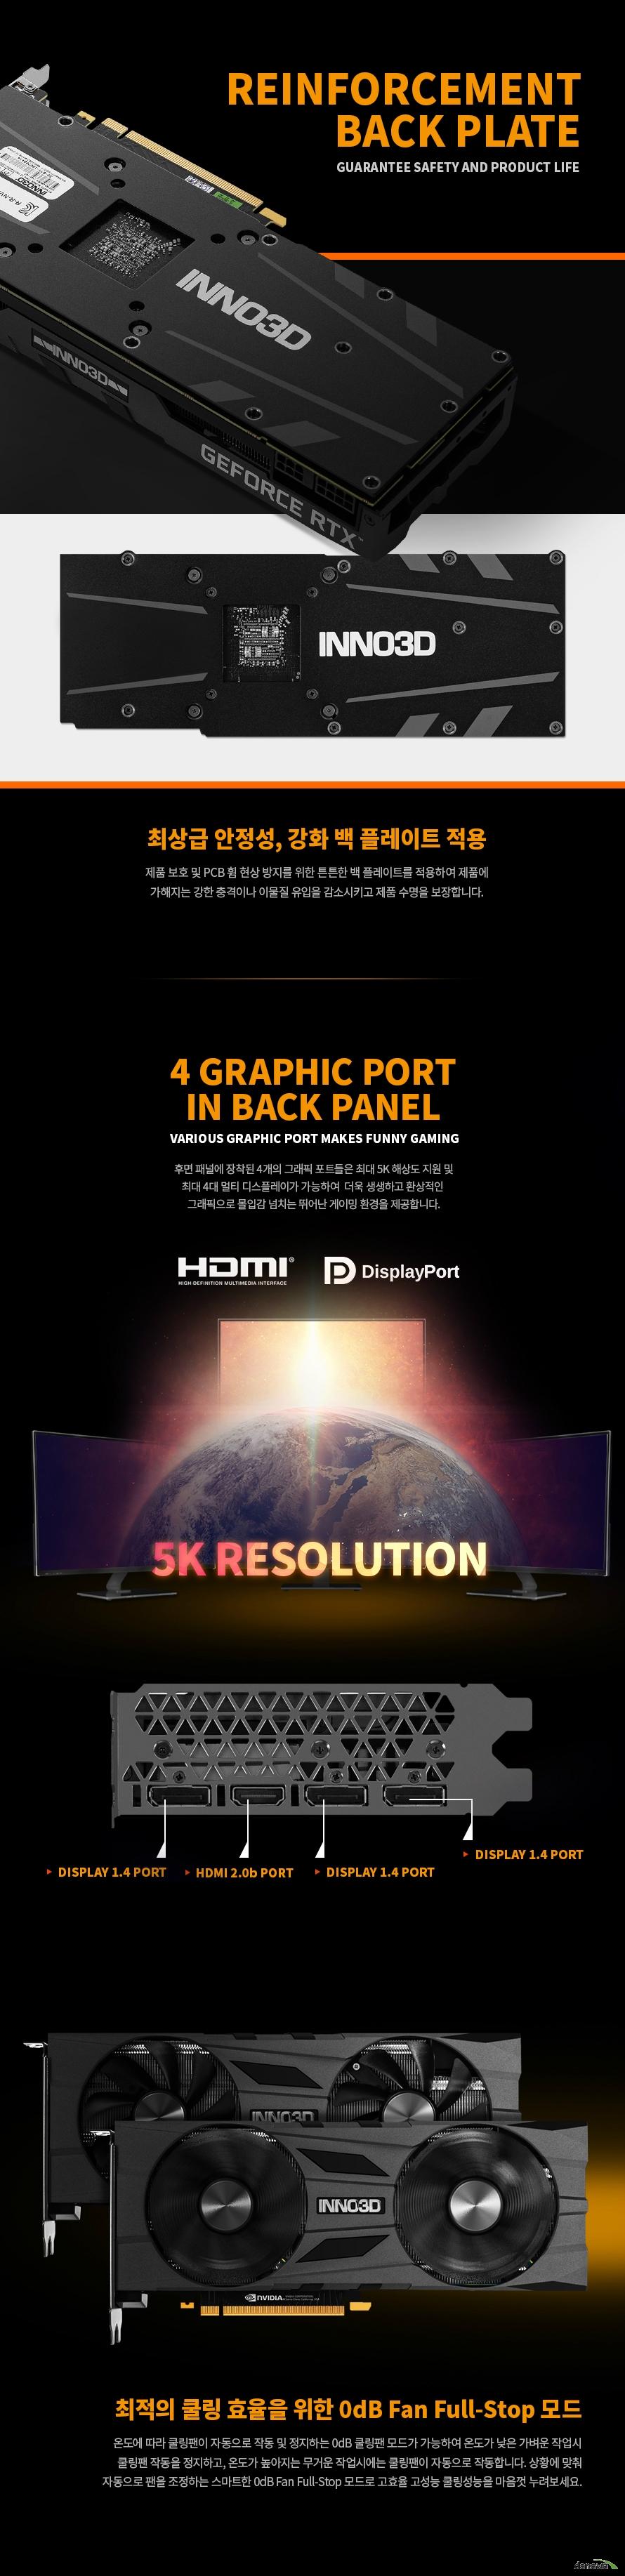 INNO3D  지포스 RTX 2070 SUPER OC D6 8GB 백플레이트